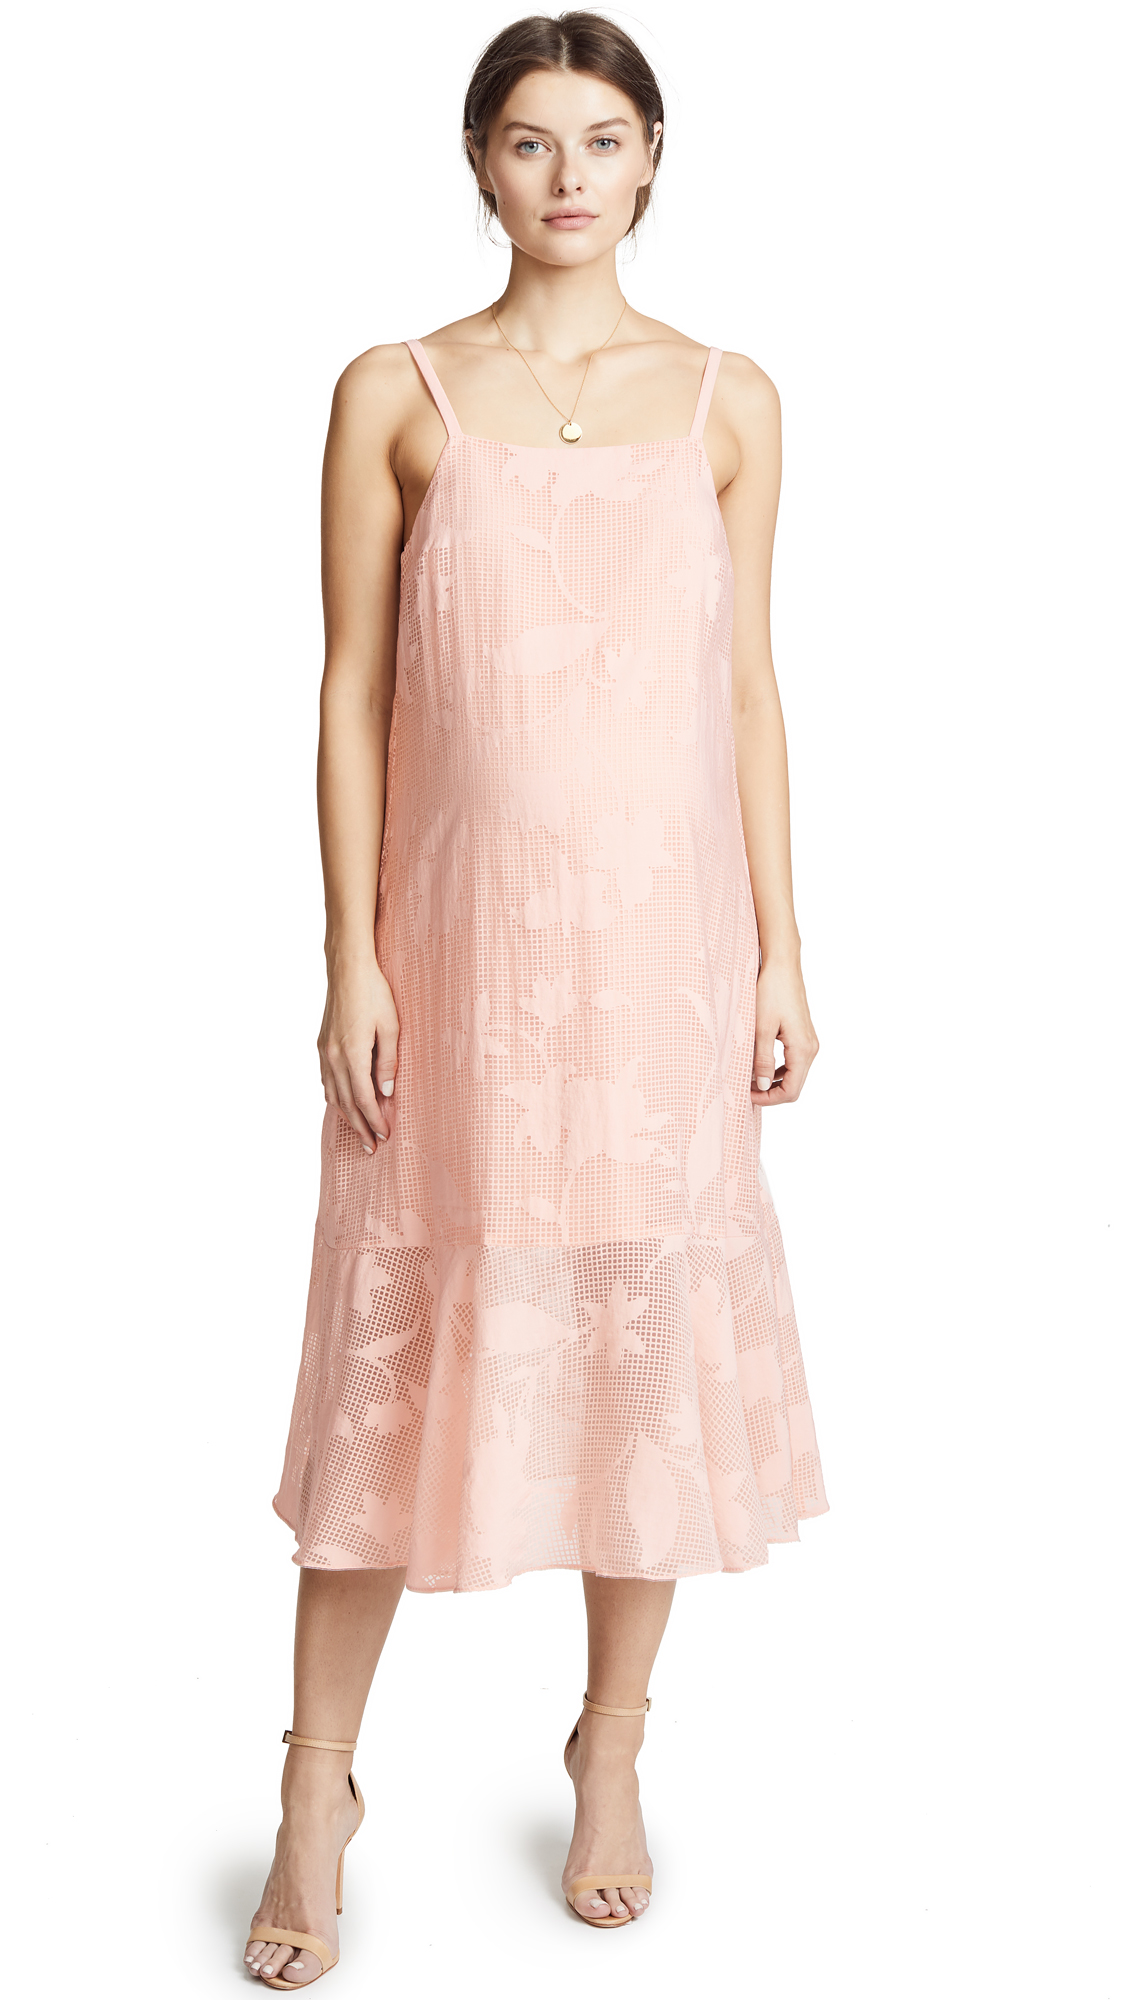 HATCH Paola Dress